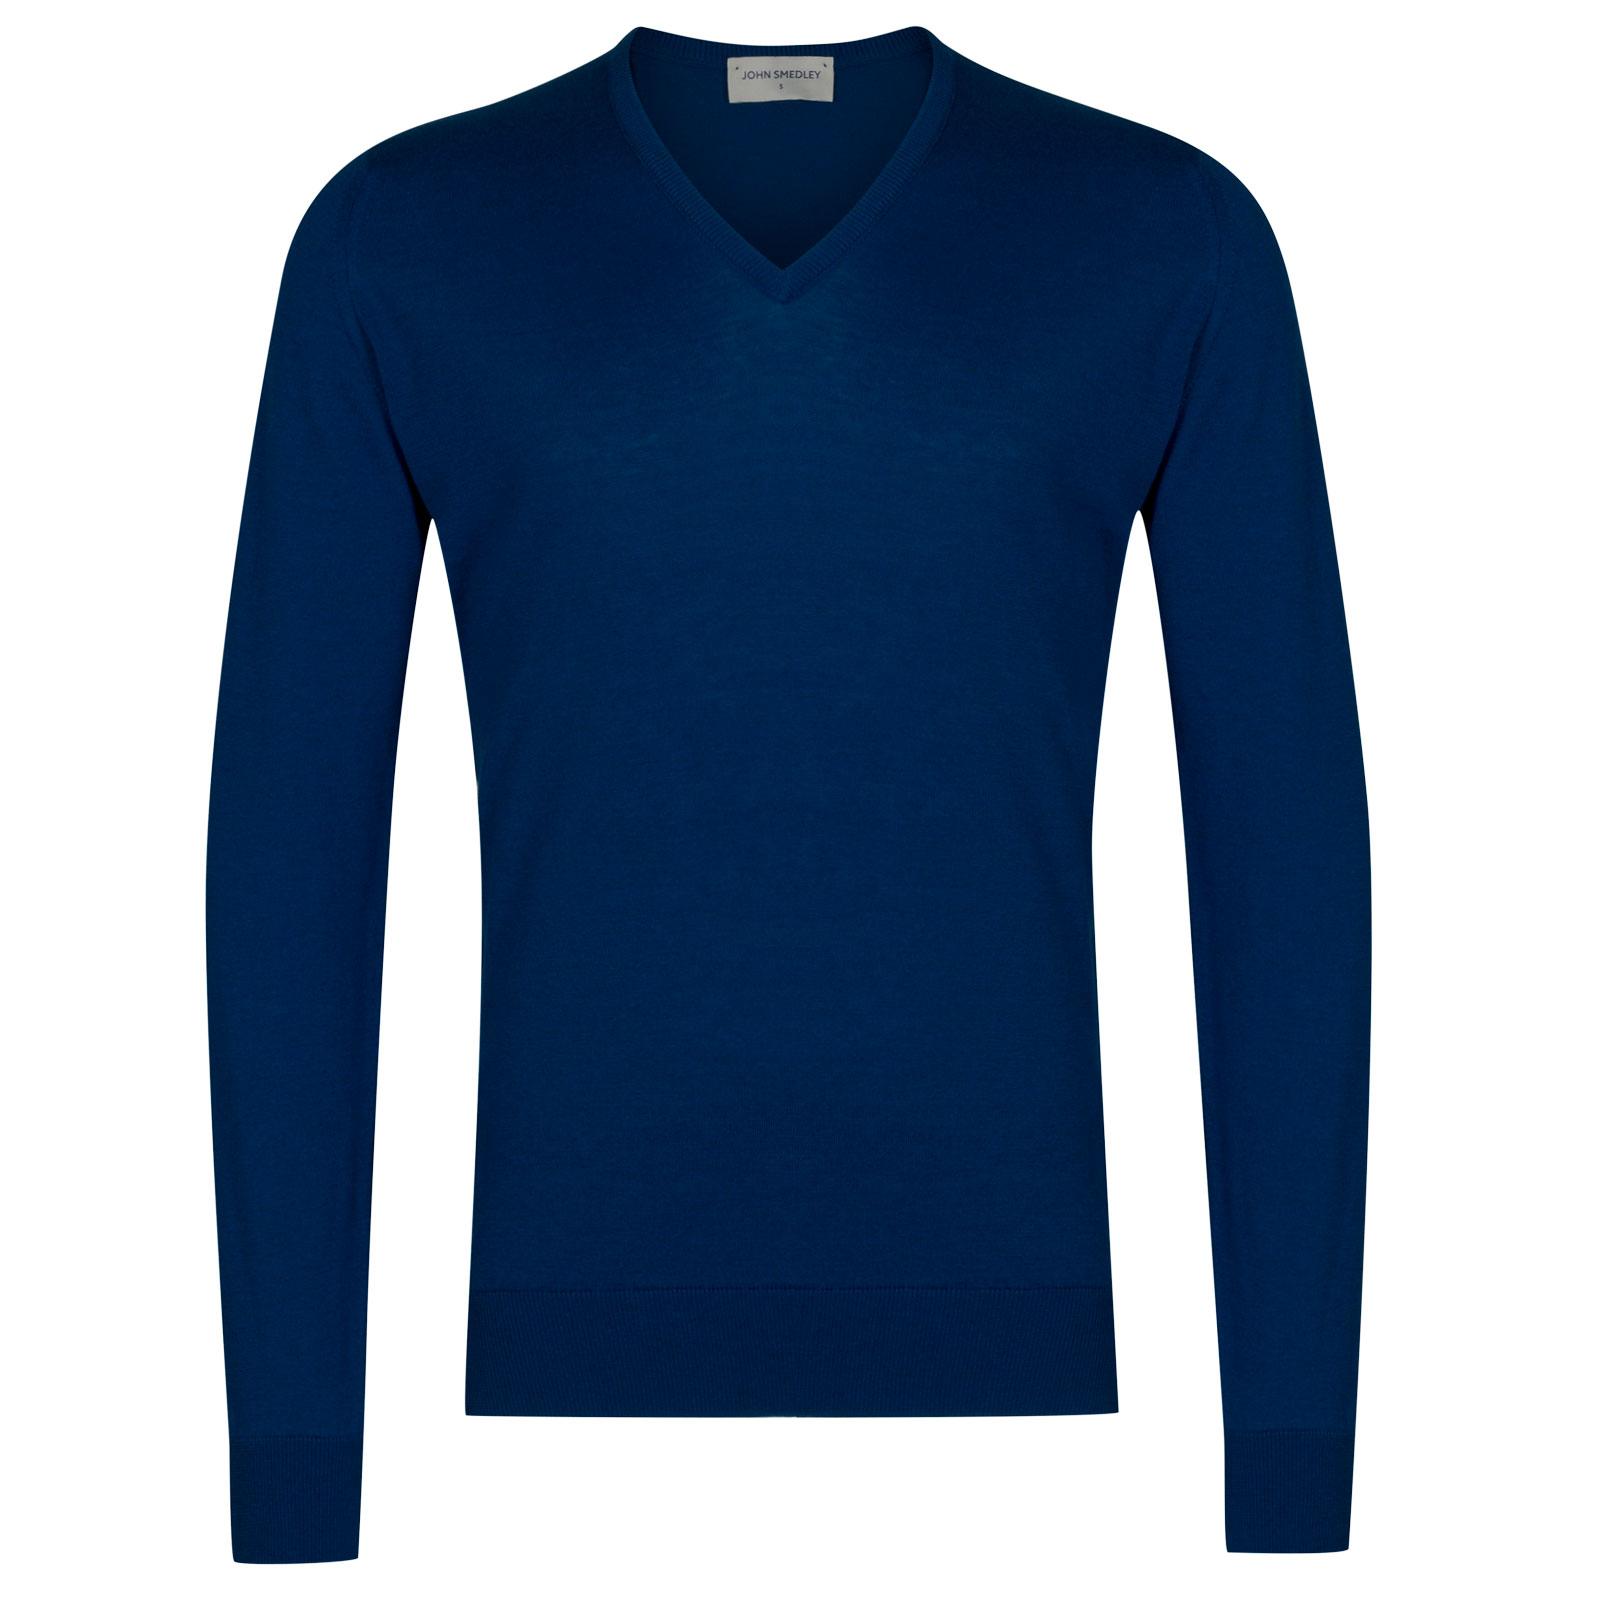 woburn-stevens-blue-Xl